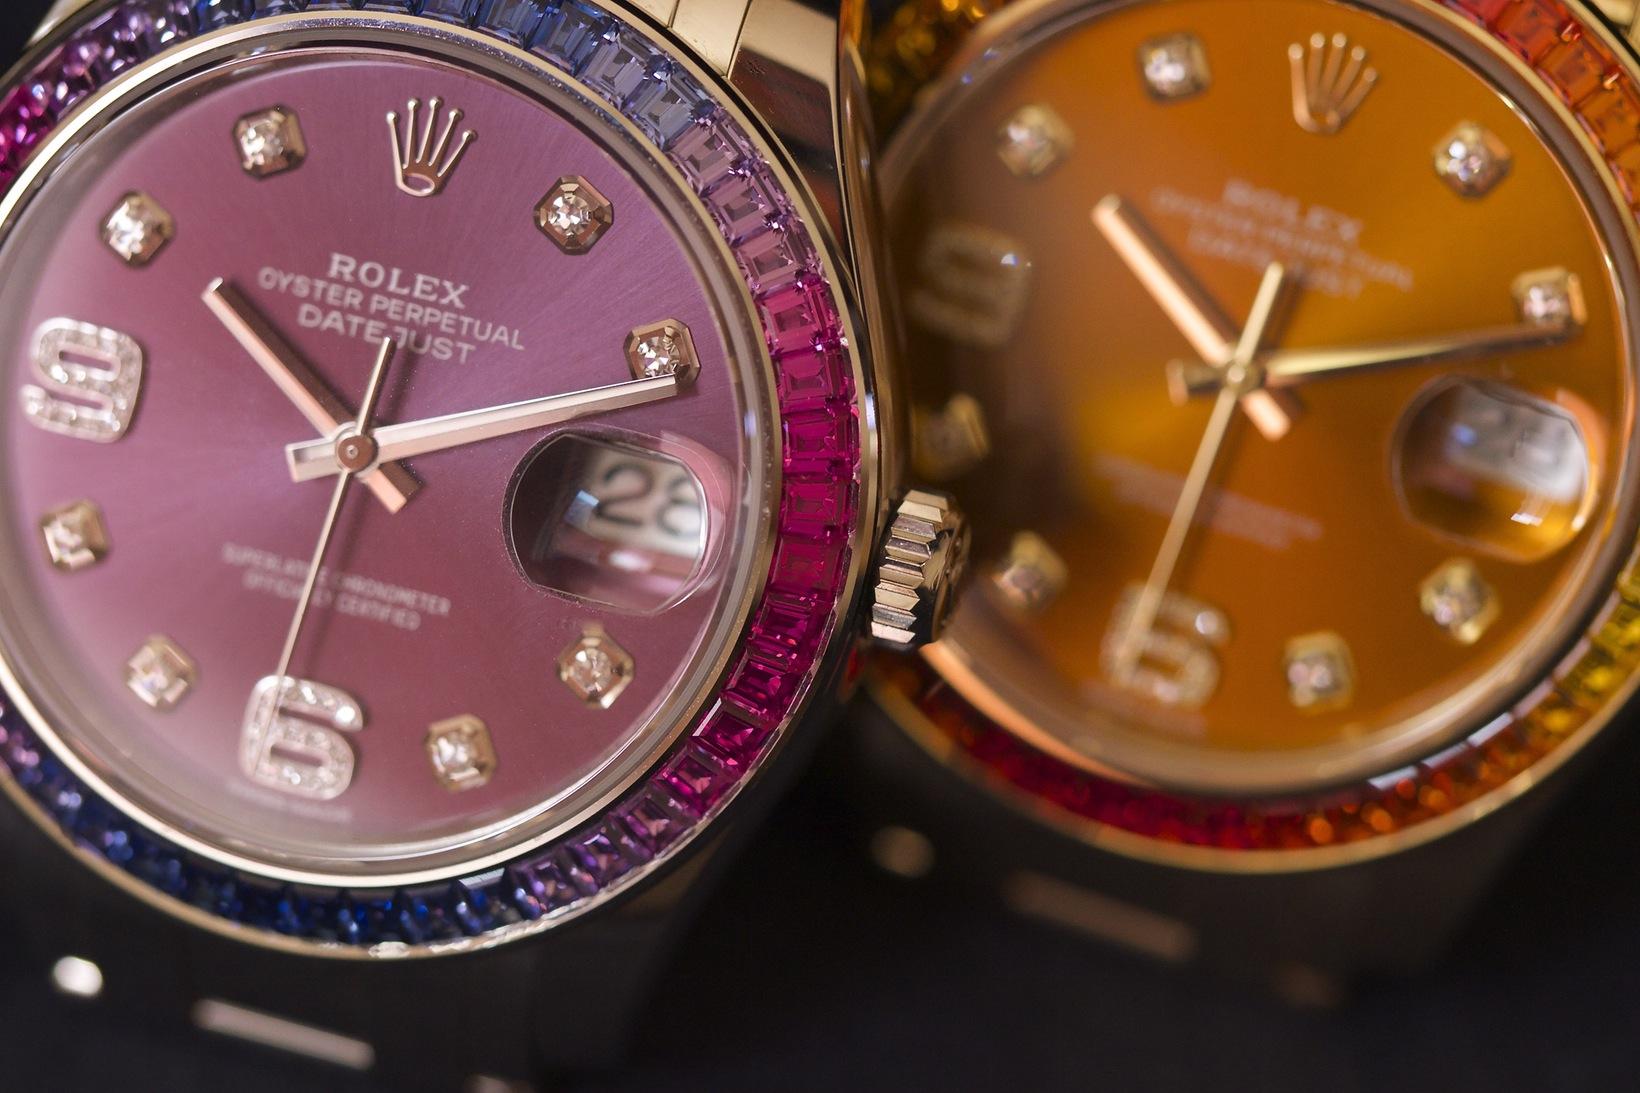 Rolex-Day-Date-Watches